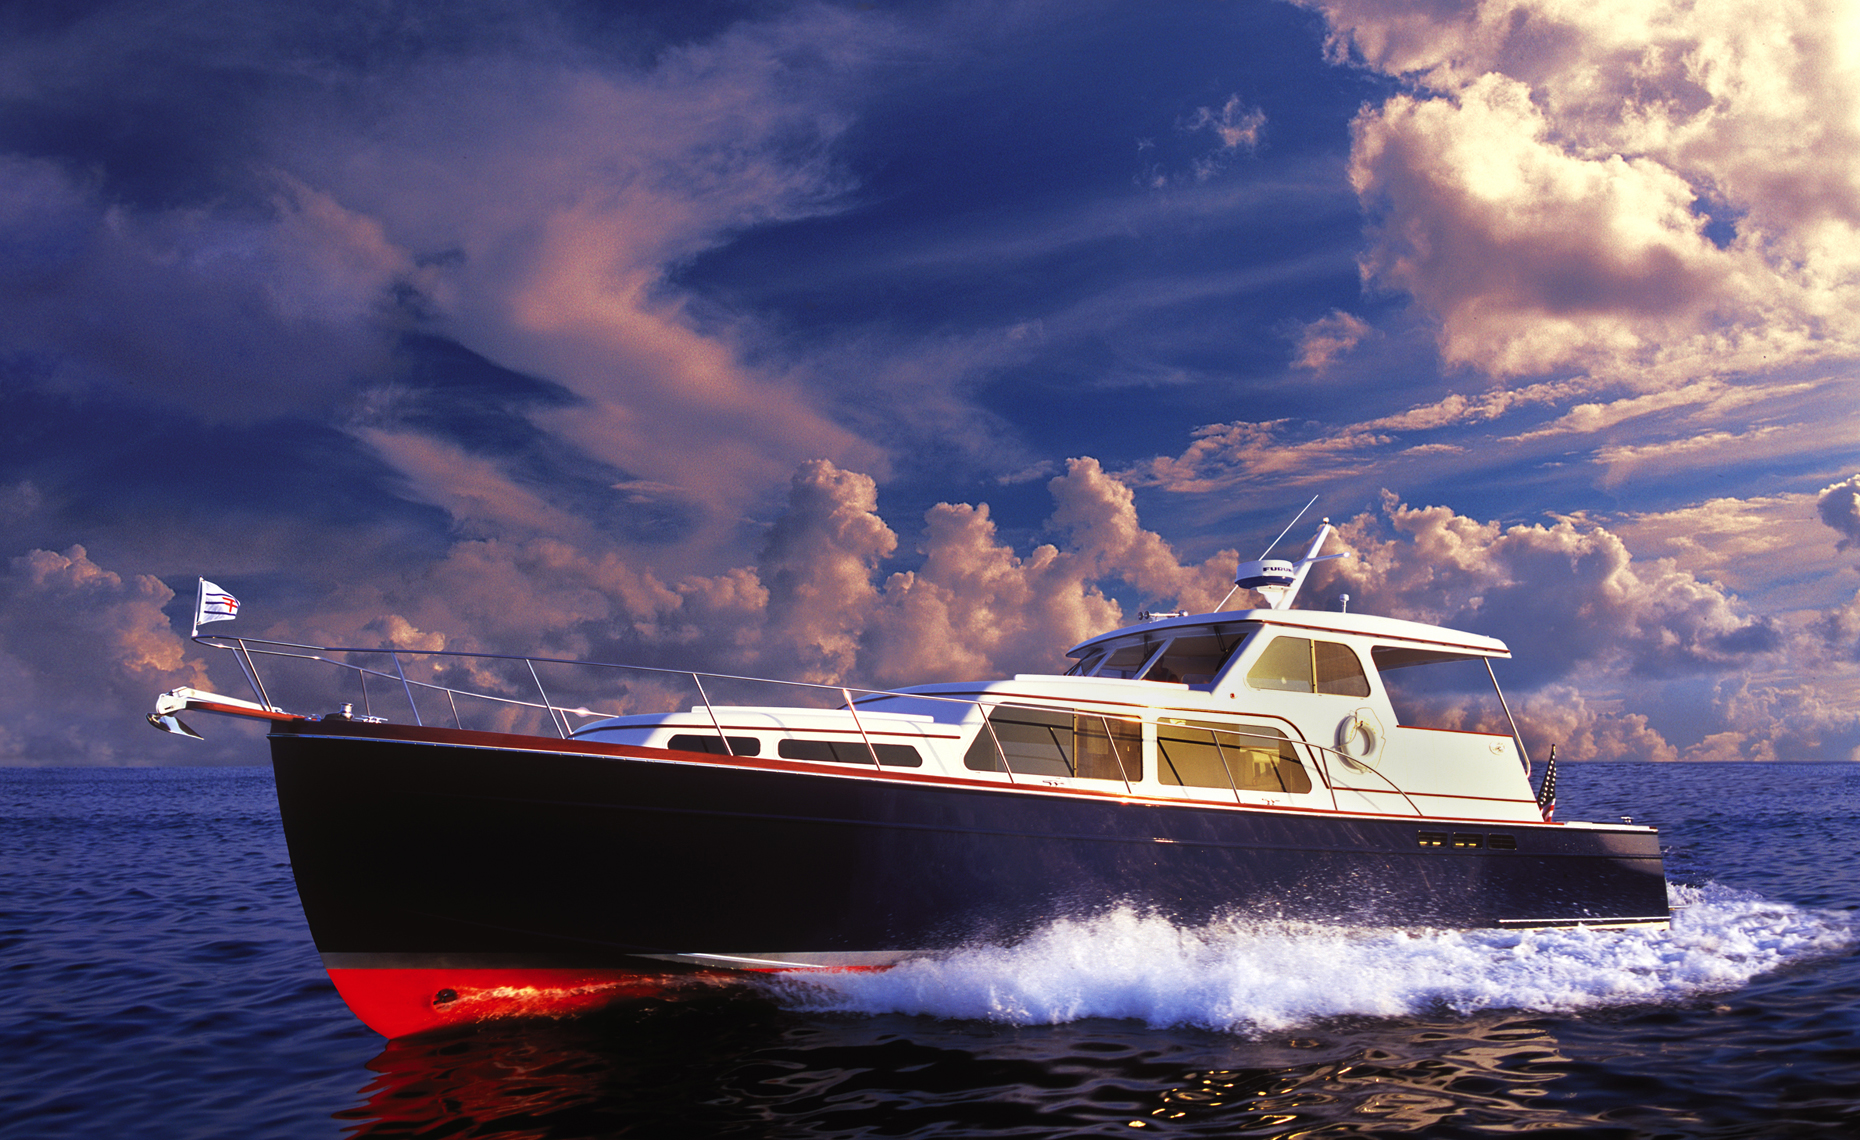 BIG boat copy.jpg